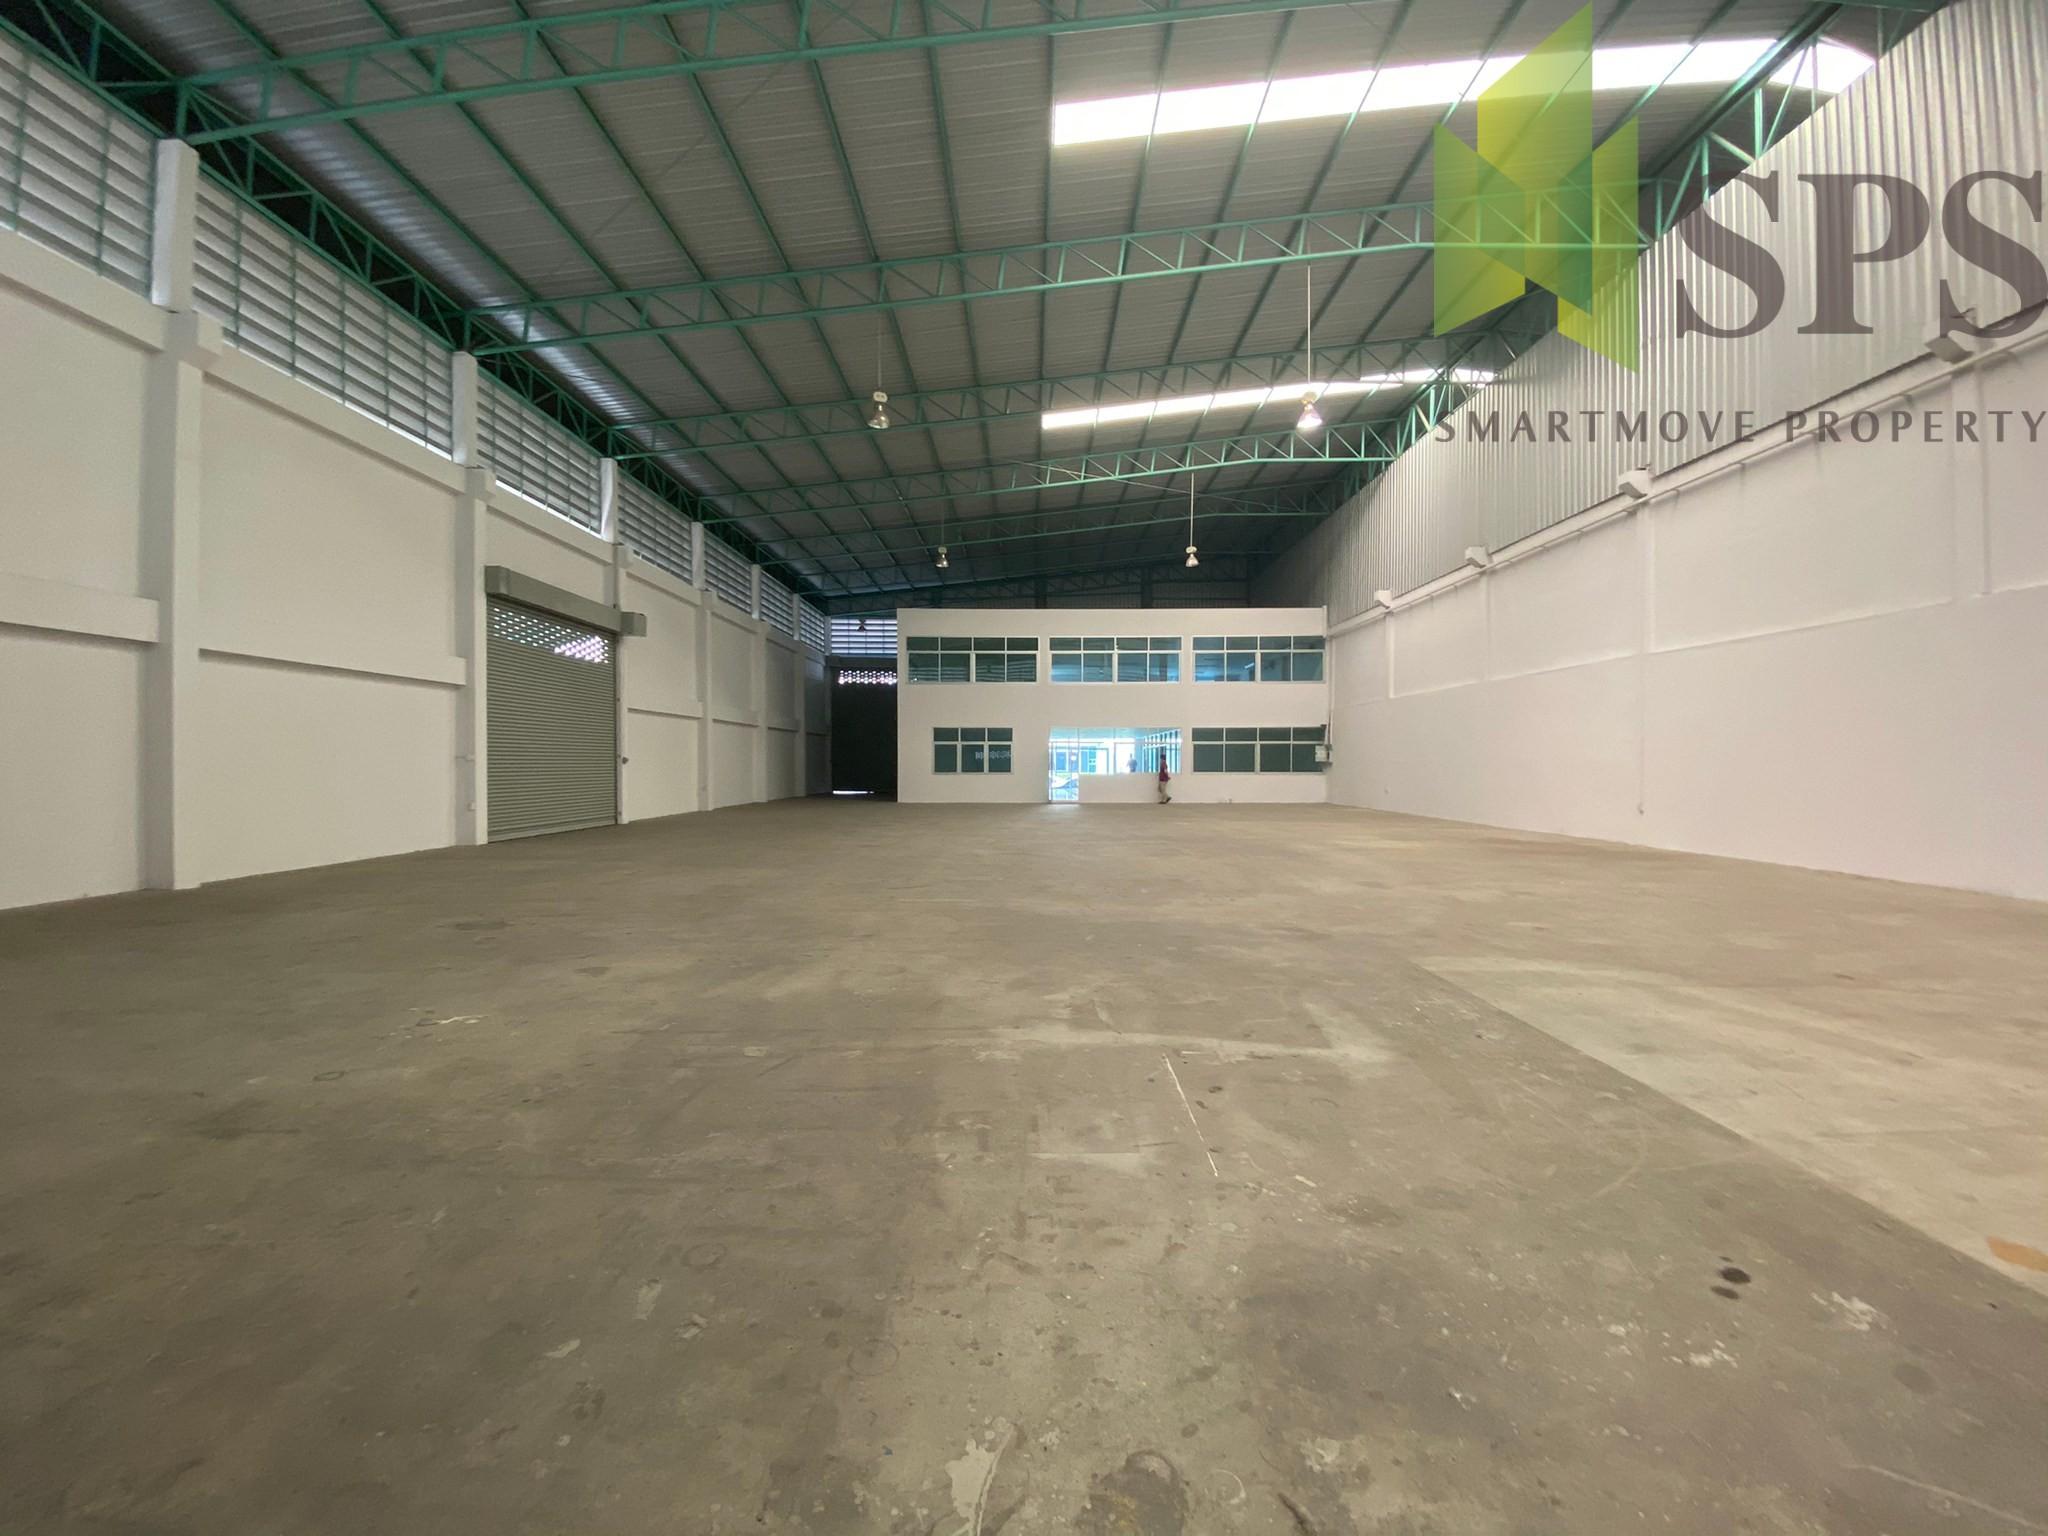 Factory, Warehouse for RENT at BangPlee-Tamru / โกดัง, โรงงานพร้อมสำนักงาน สำหรับเช่า ที่ บางพลี ตำหรุ (Property ID: SPS-PPW145)